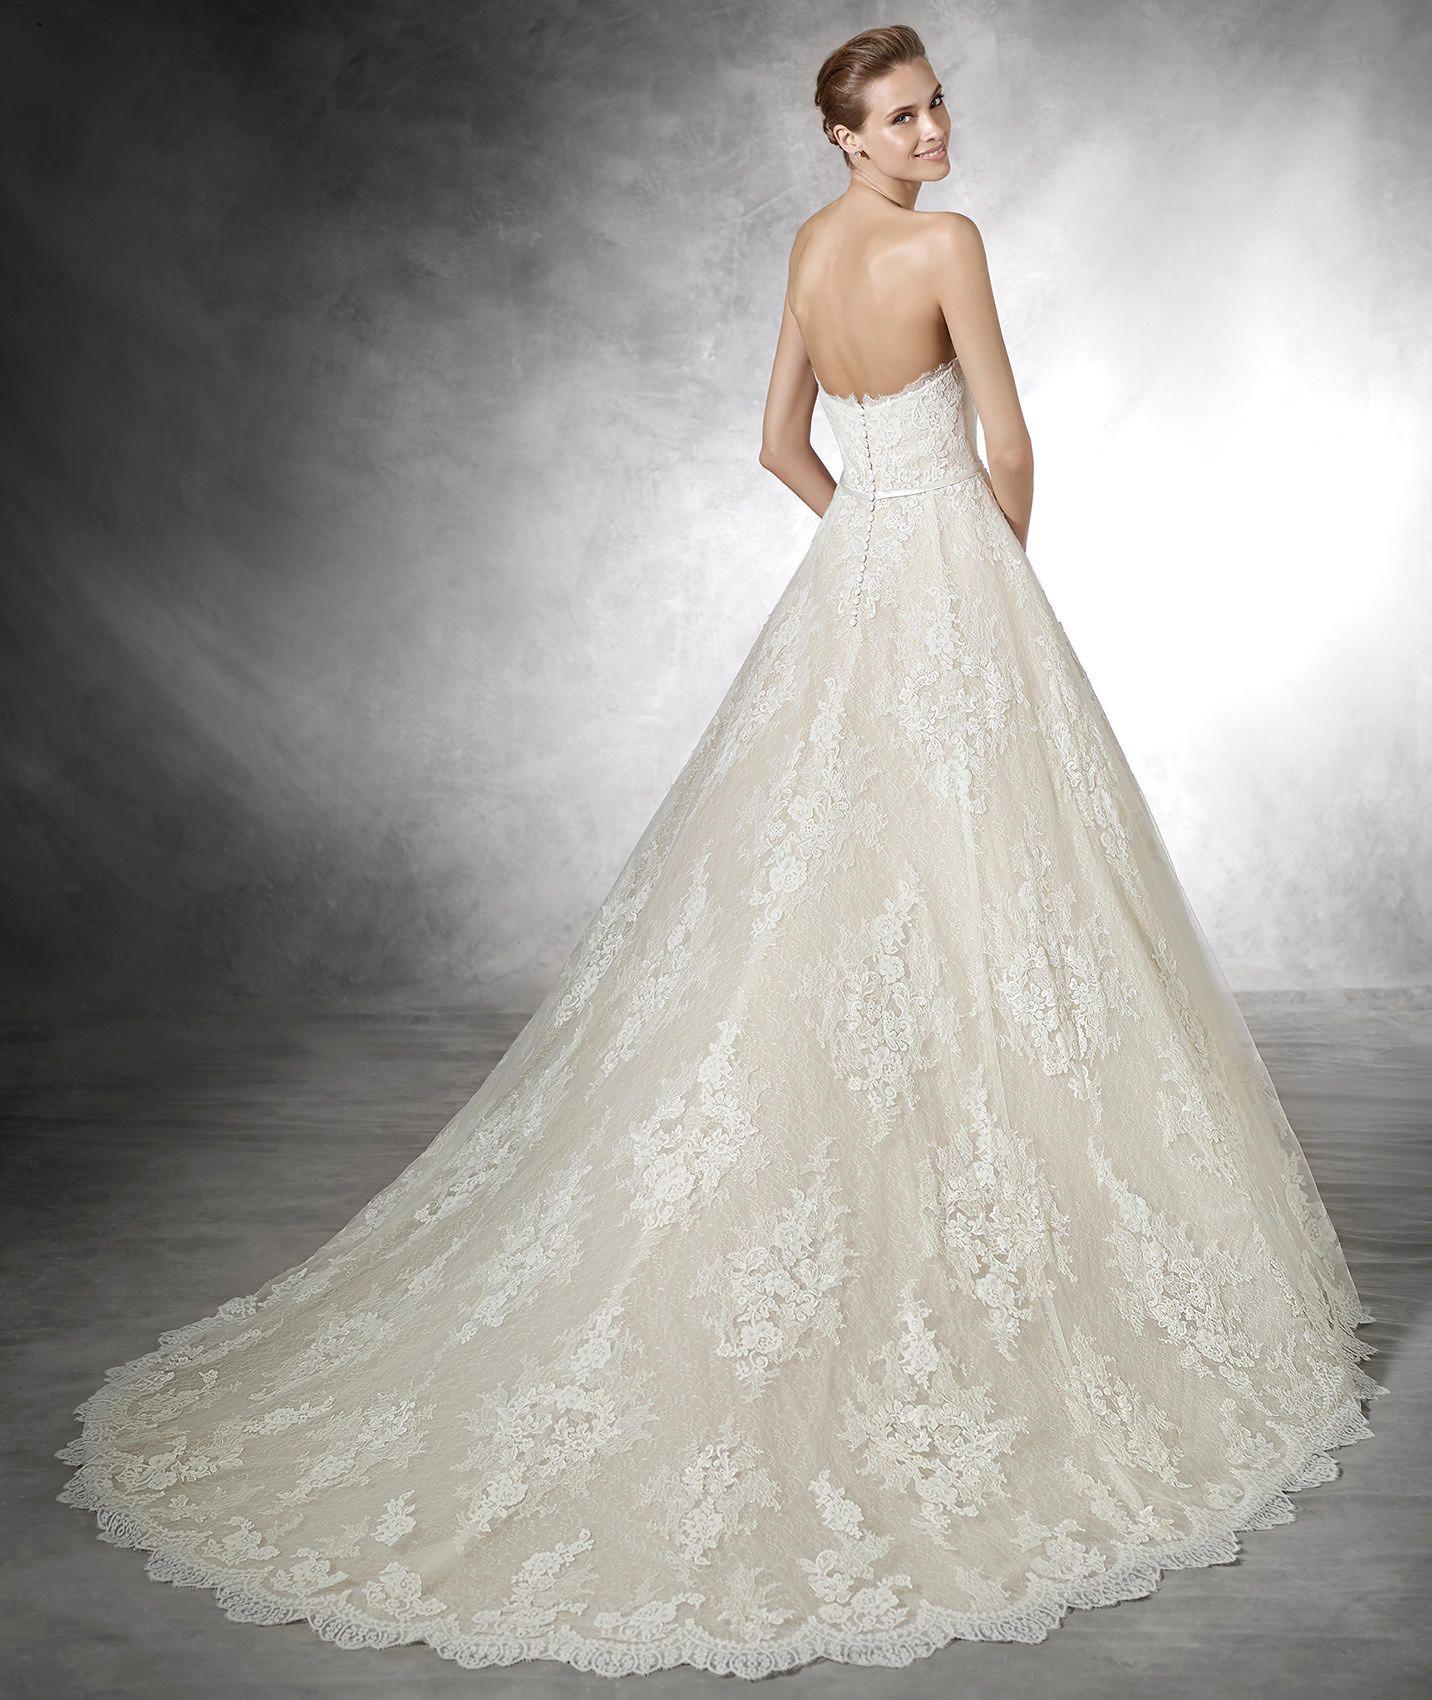 TAFFI - Princess wedding dress with sweetheart neckline | Princess ...